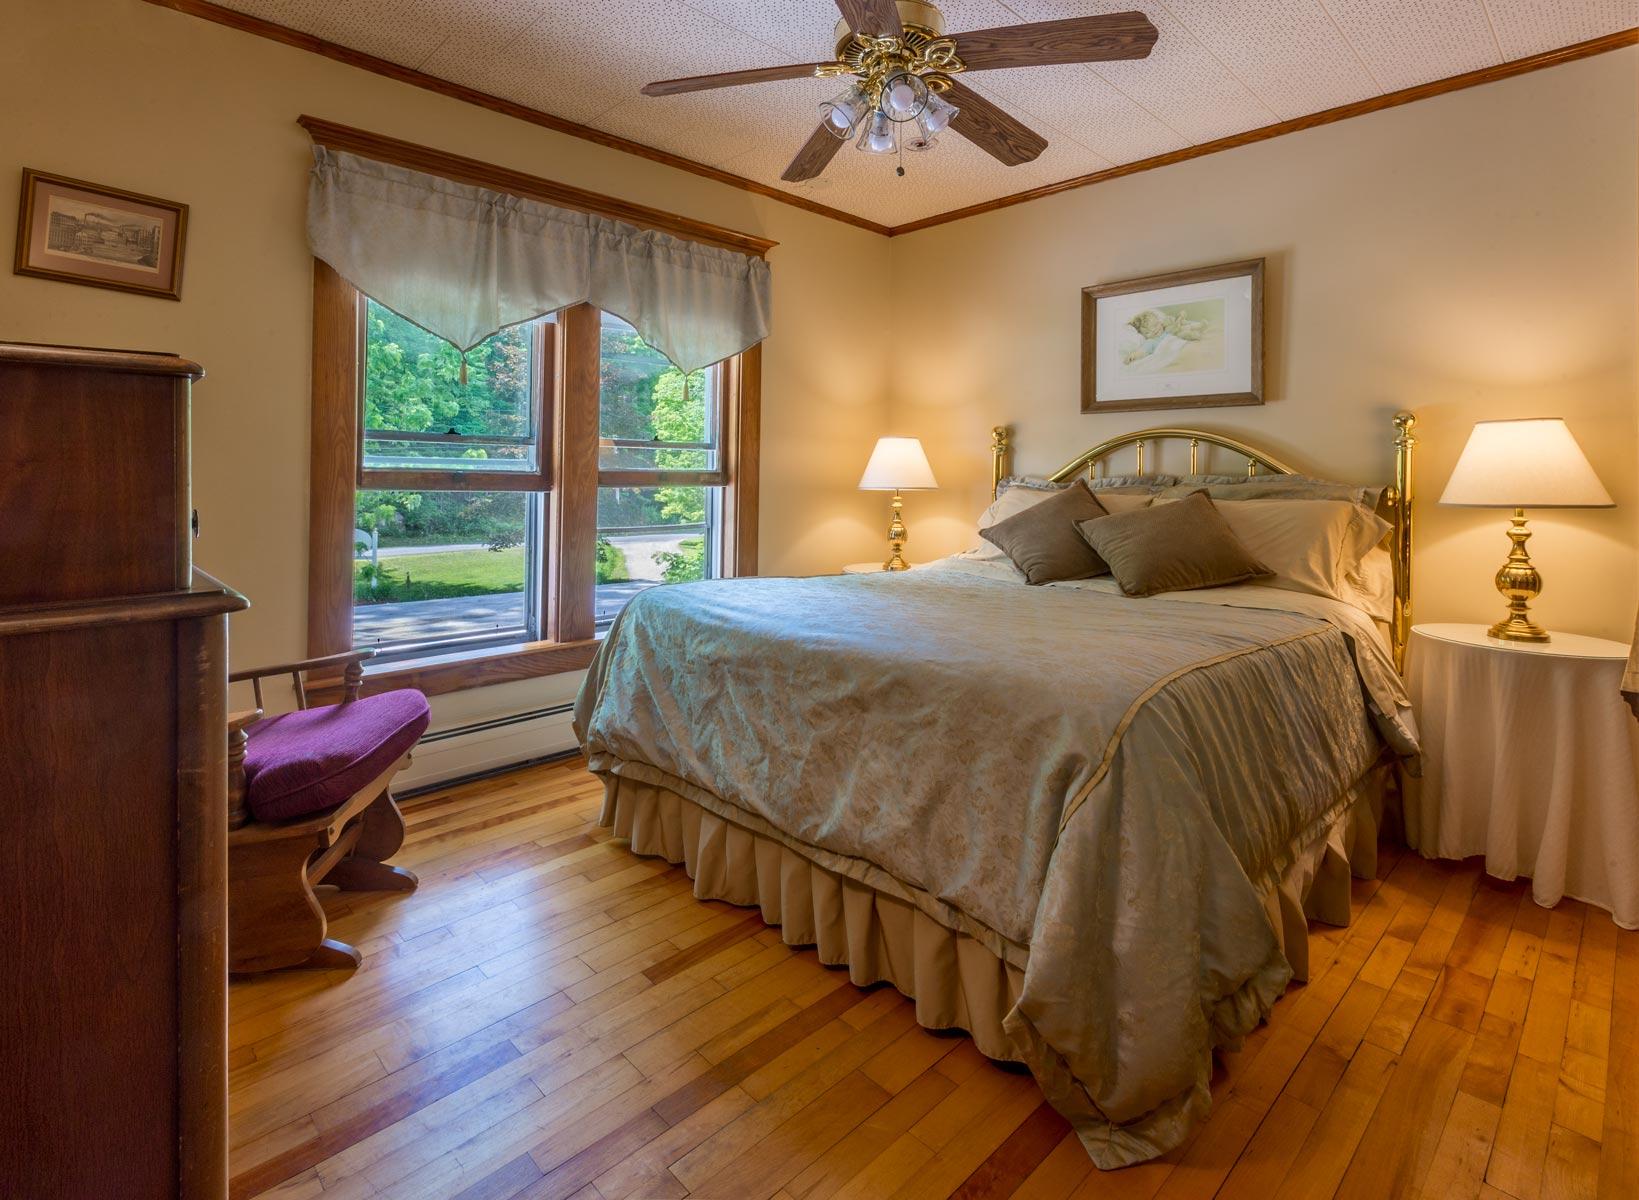 The Marguerite Elizabeth Room